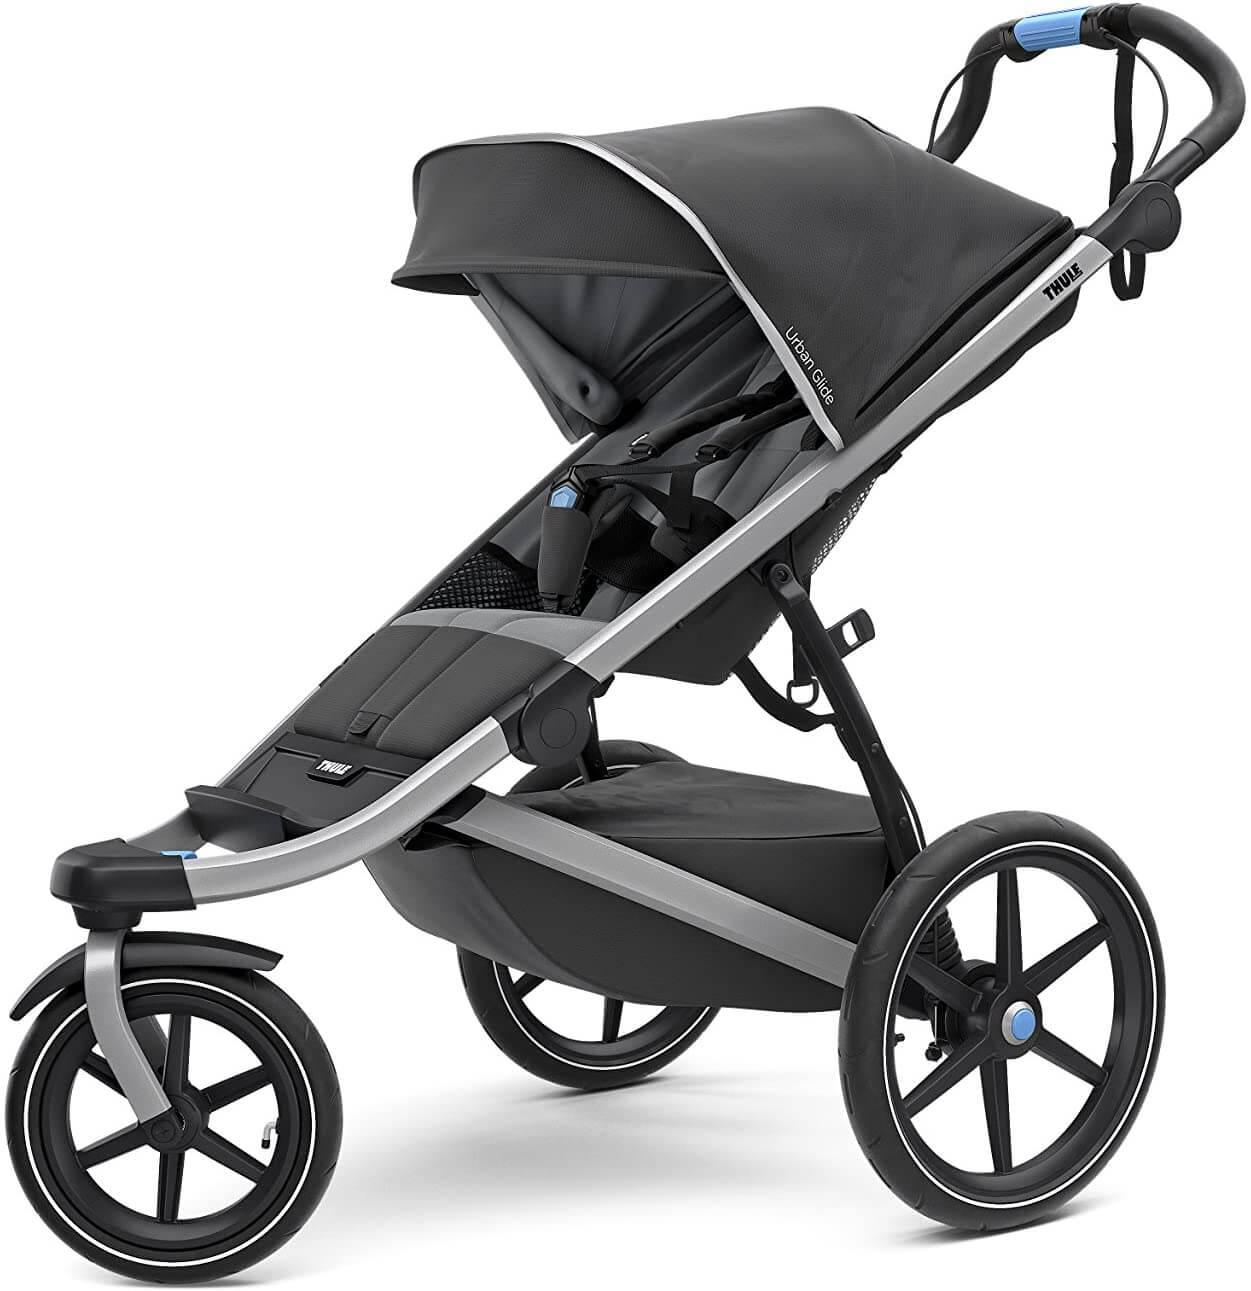 Thule Urban Glide 2 Jogging best baby Stroller